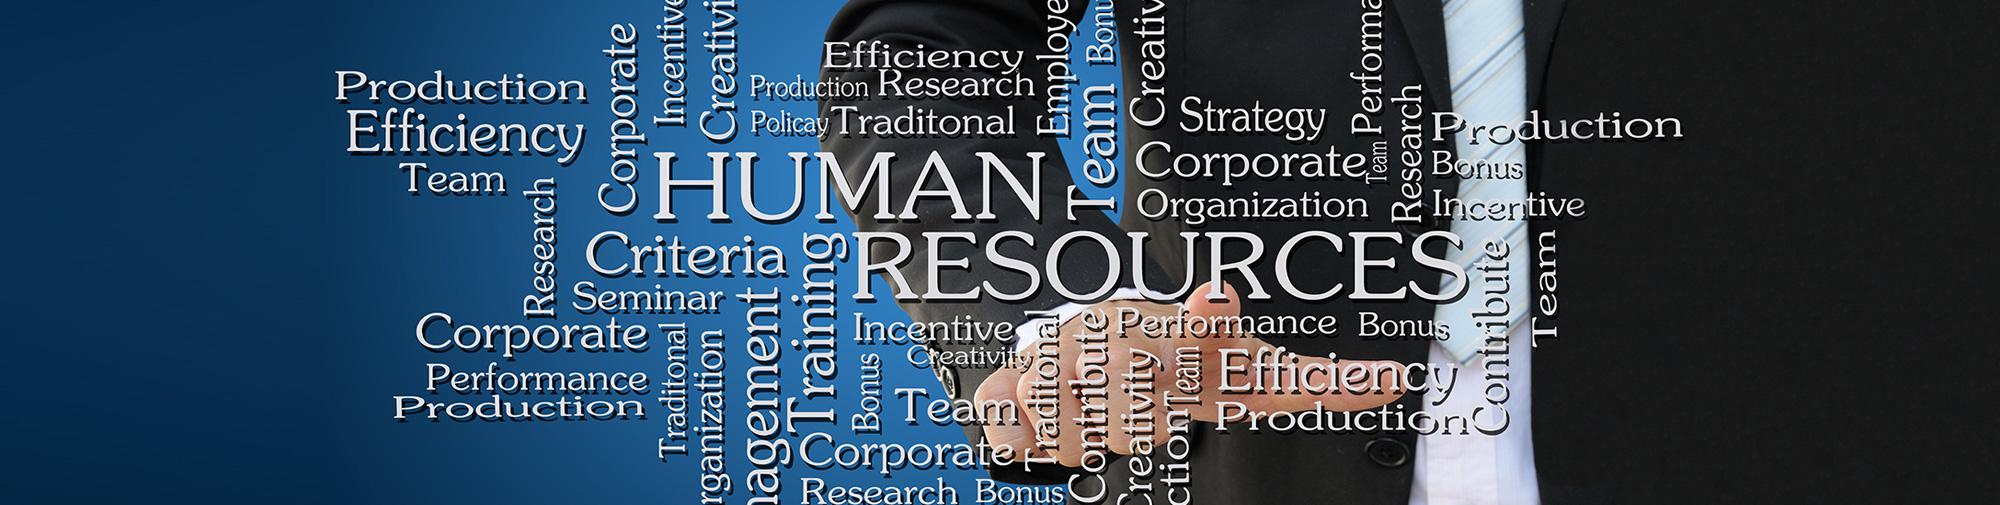 http://www.gekterna.com/userfiles/11e3ebfa-92f9-4083-8c5b-a26d00fe9b3c/Human_Resources_2.jpg